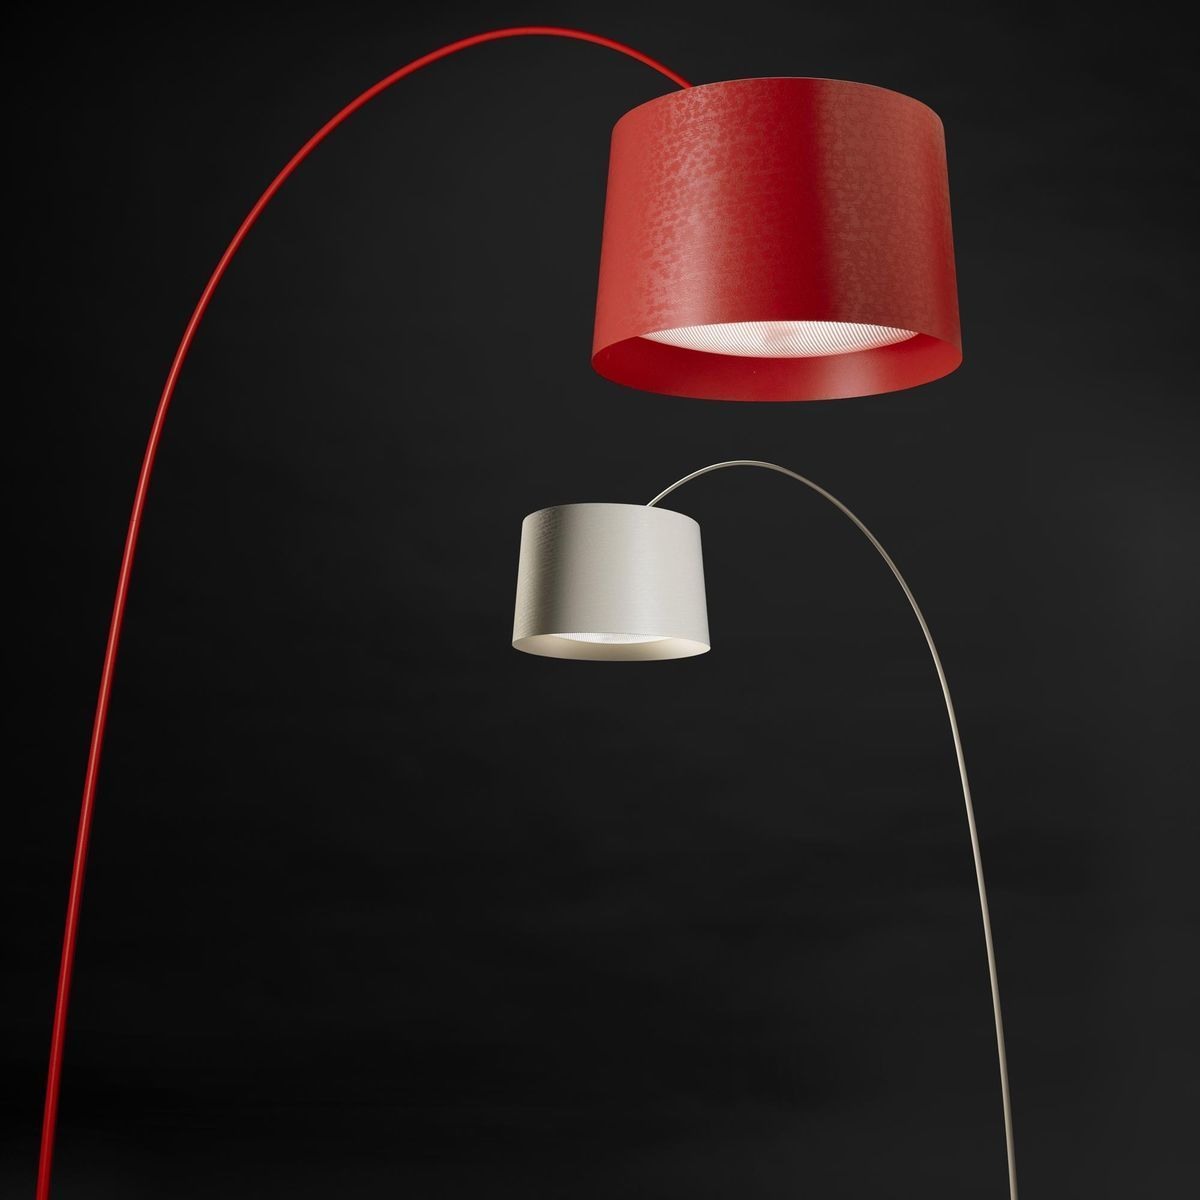 twiggy led stehleuchte foscarini. Black Bedroom Furniture Sets. Home Design Ideas